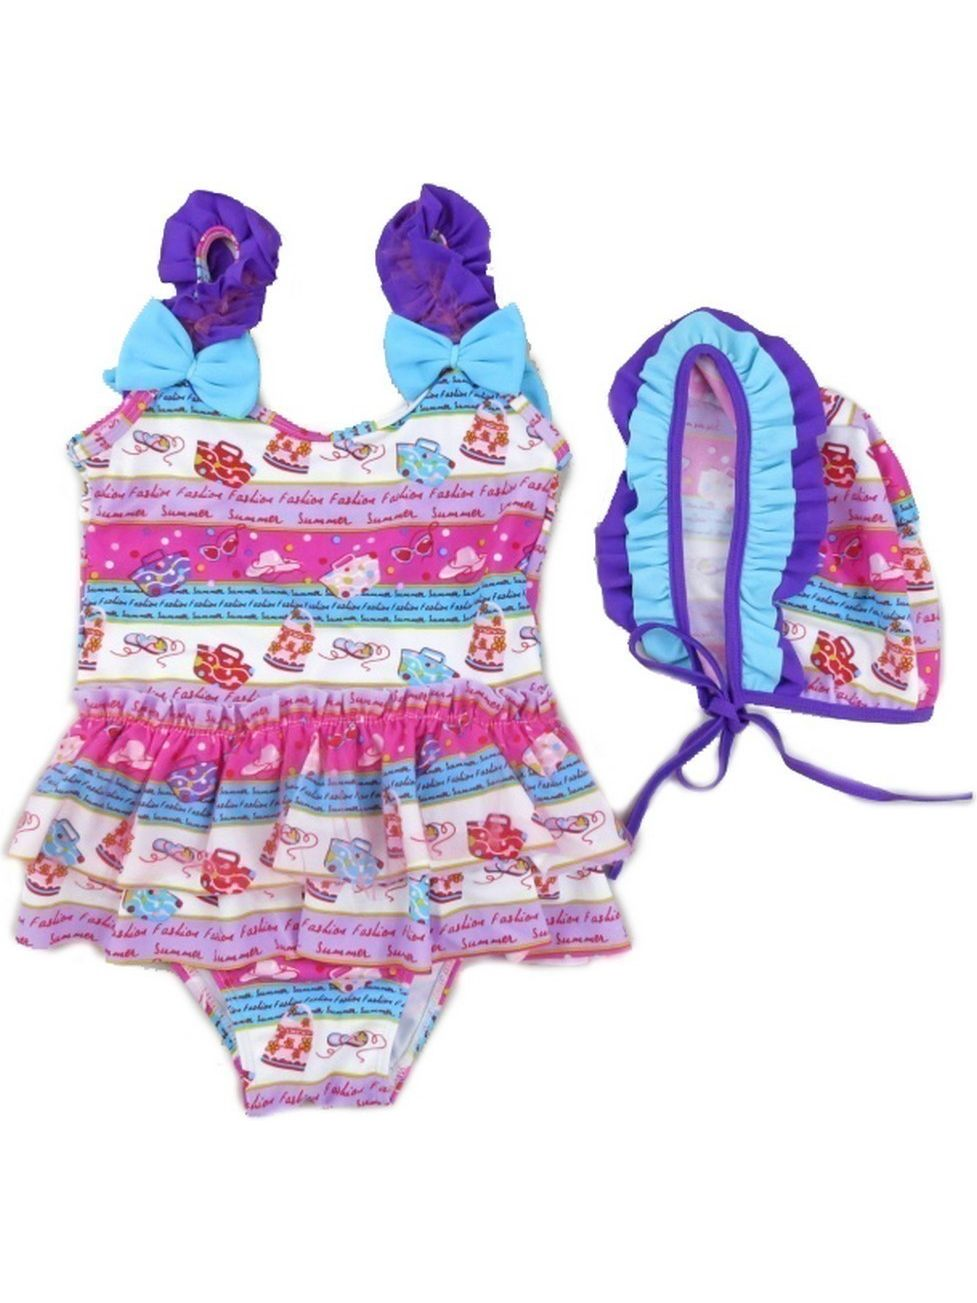 Wenchoice Little Girls Purple Blue Fashion Print Ruffle Cap Swimsuit